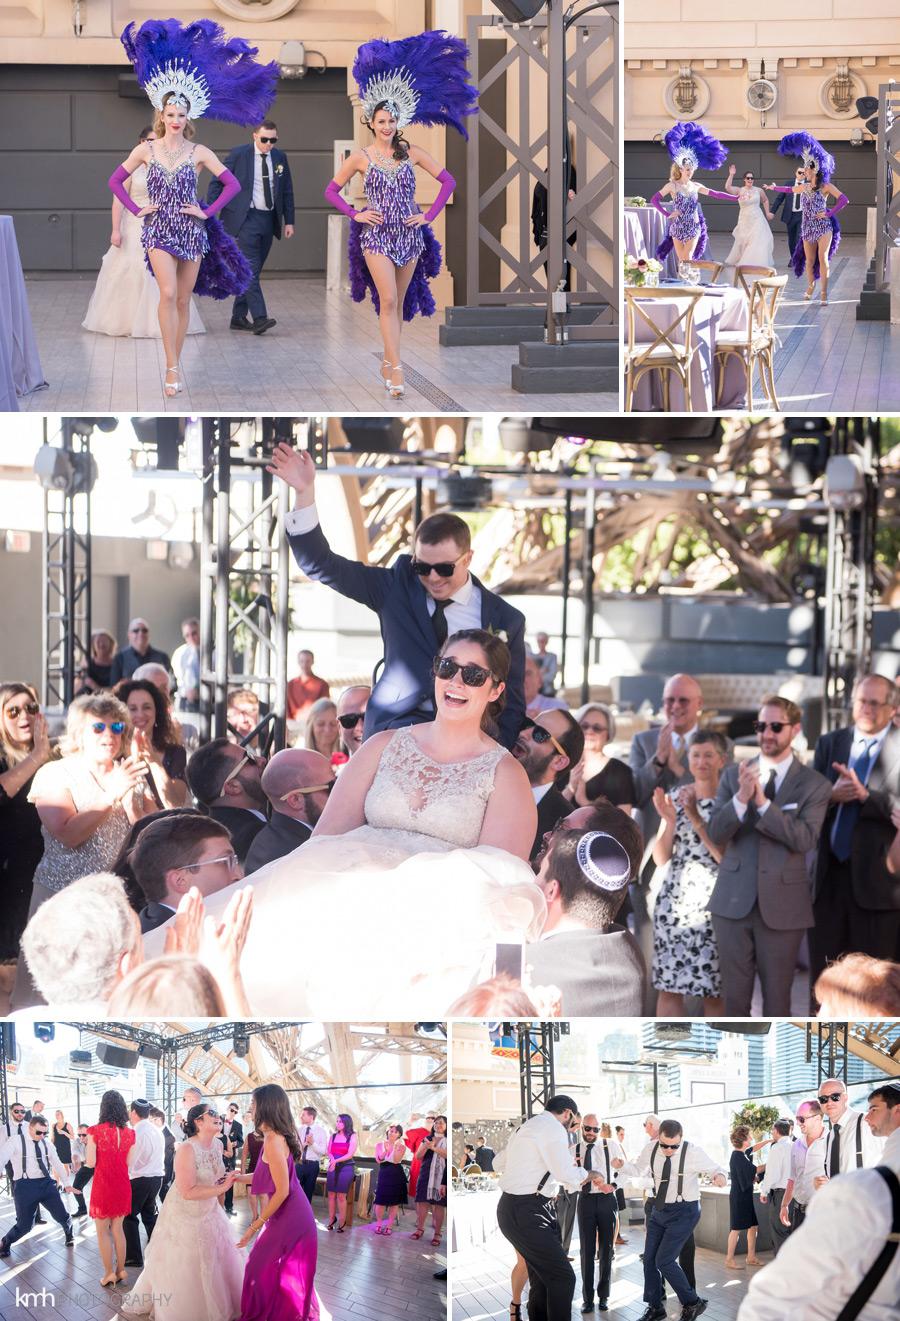 Elegant Rooftop Wedding at Chateau Nightclub at Paris Las Vegas | KMH Photography, Las Vegas Wedding Photographer